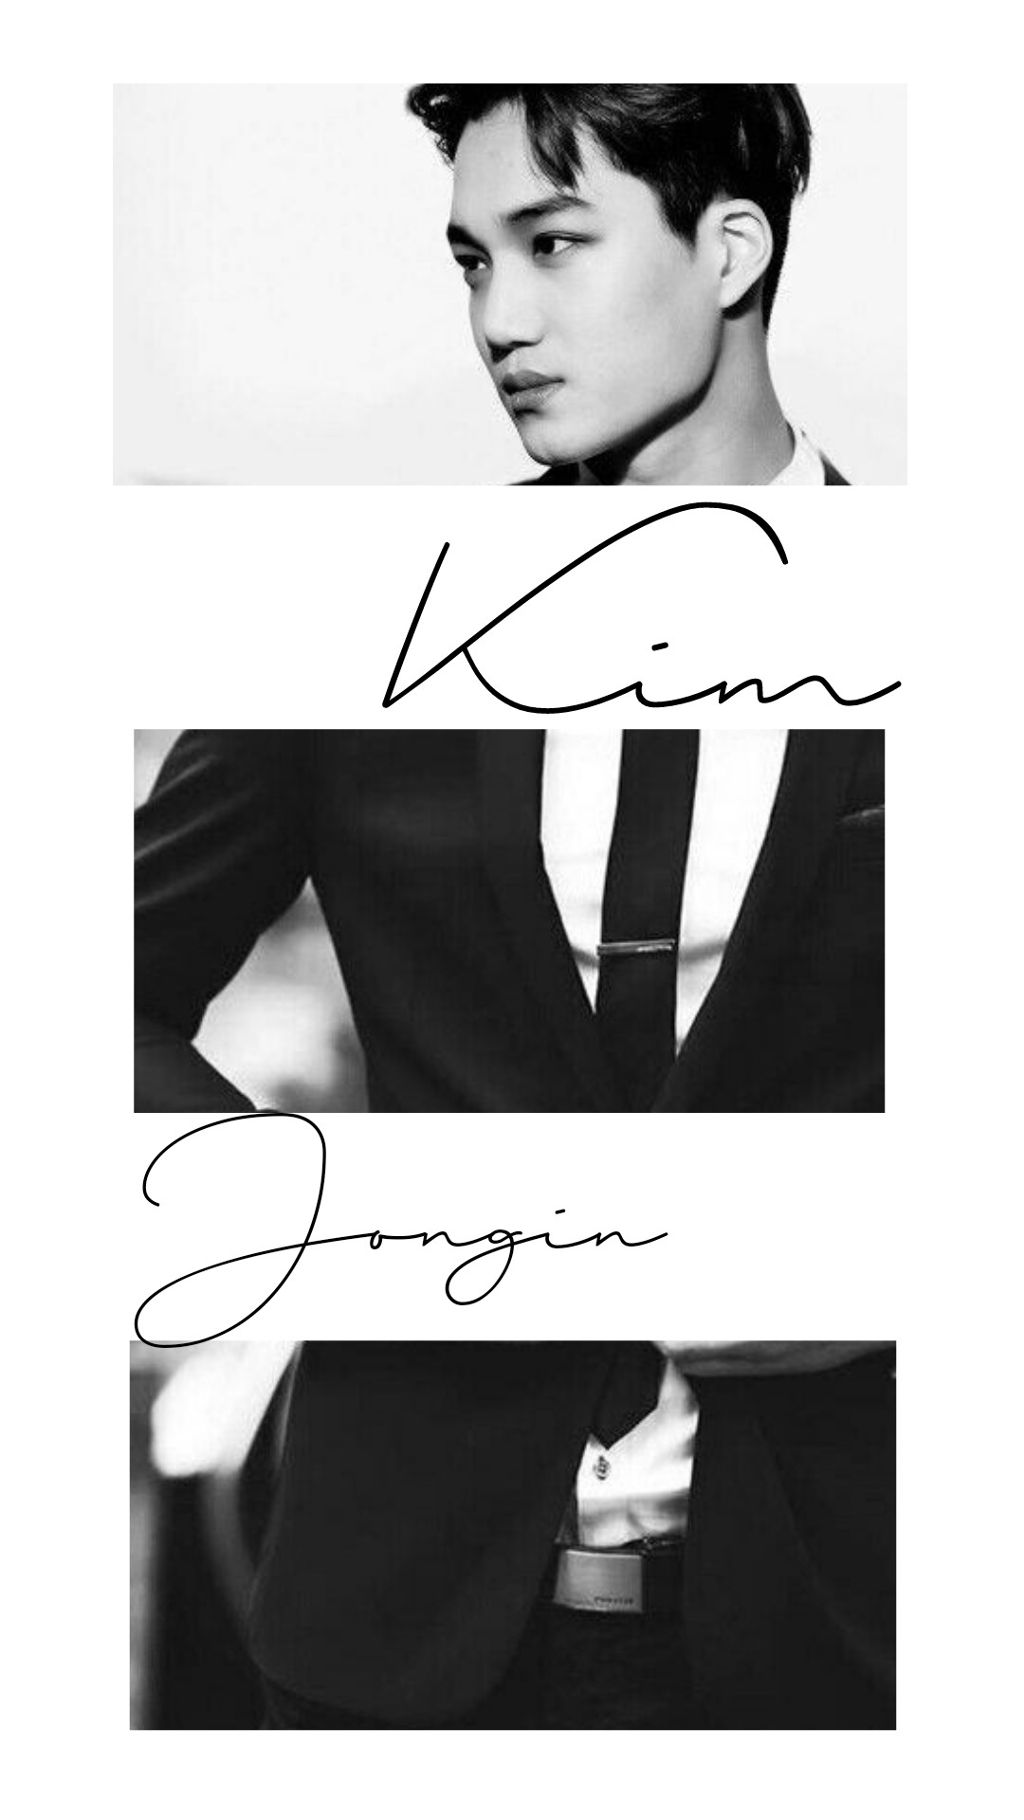 Exo Kai Kim Jongin Wallpaper White Man Black Suit 550622 Hd Wallpaper Backgrounds Download